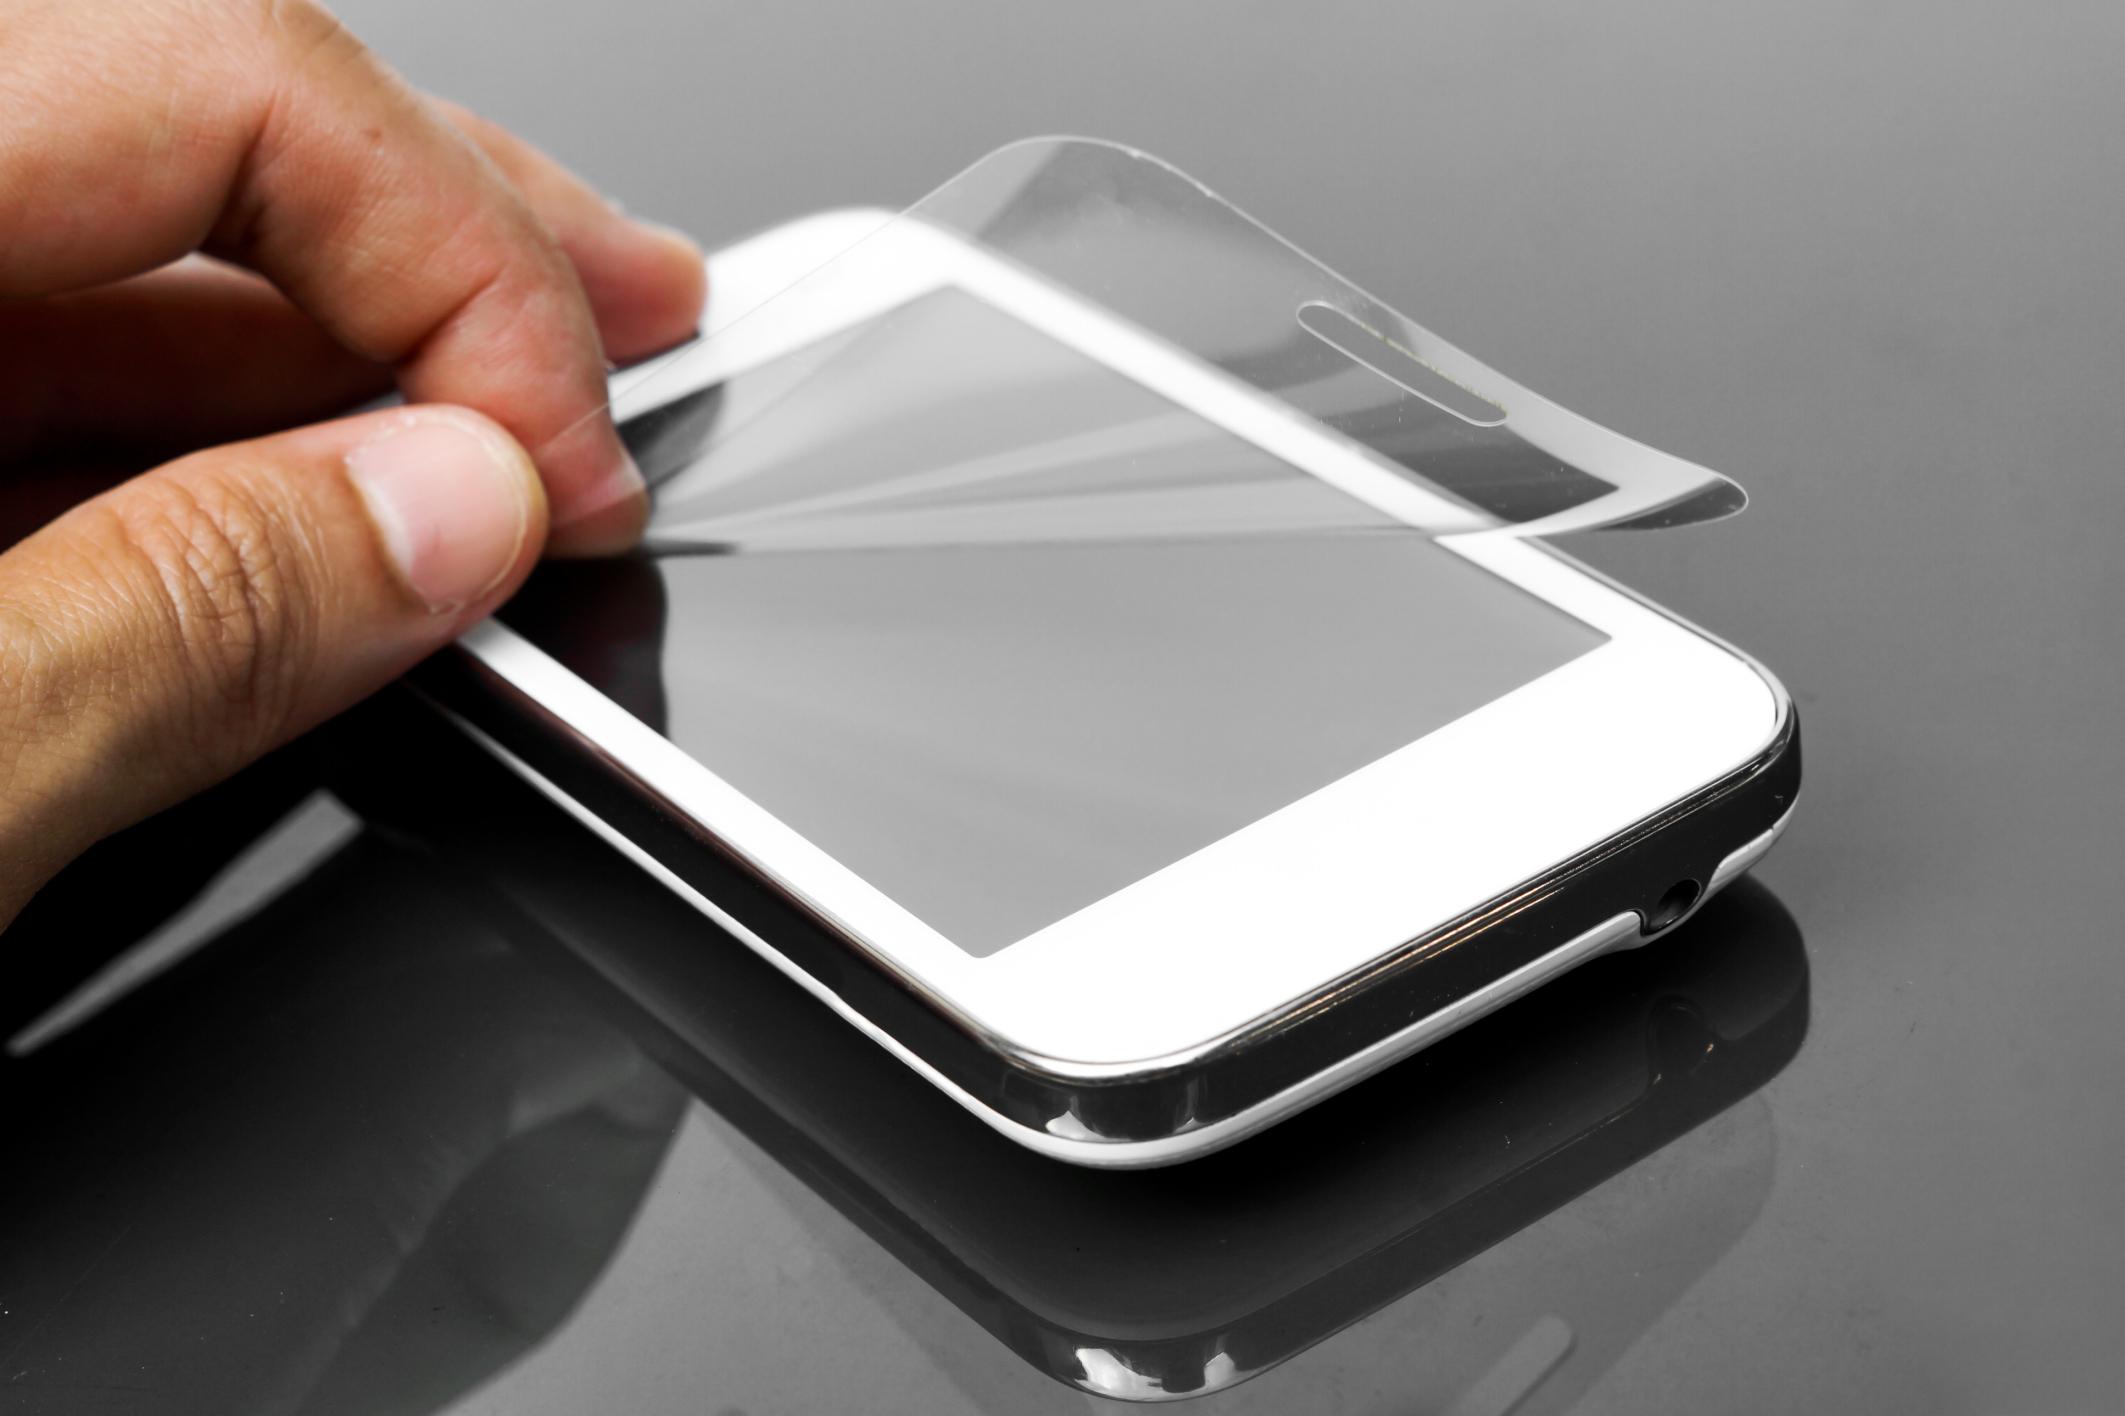 איך לנקות מסך של אייפון?